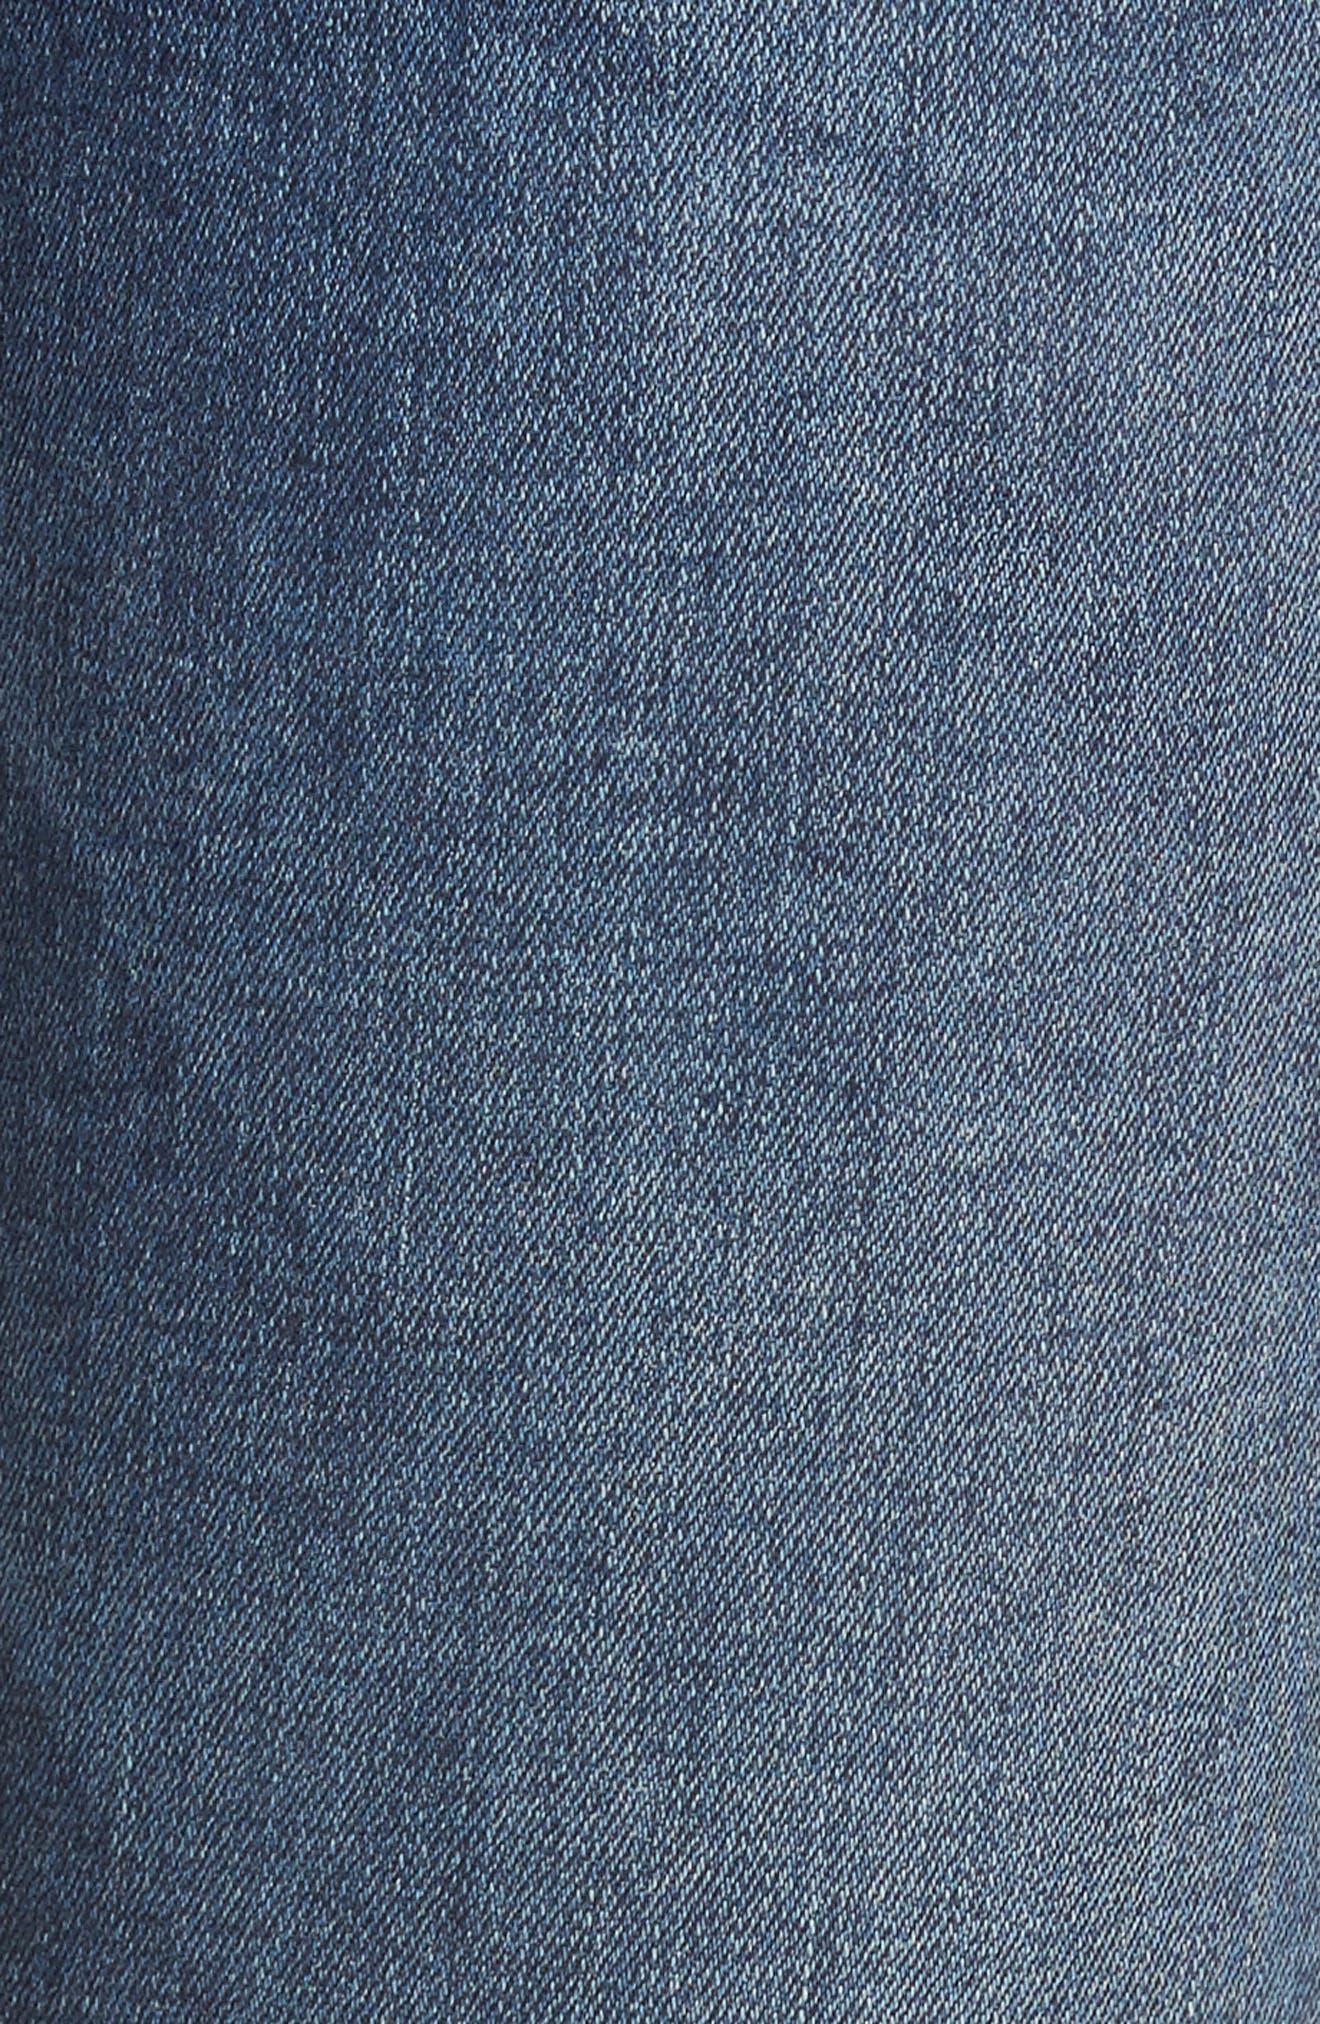 Tuxedo Stripe Ripped Skinny Jeans,                             Alternate thumbnail 7, color,                             Medium Wash